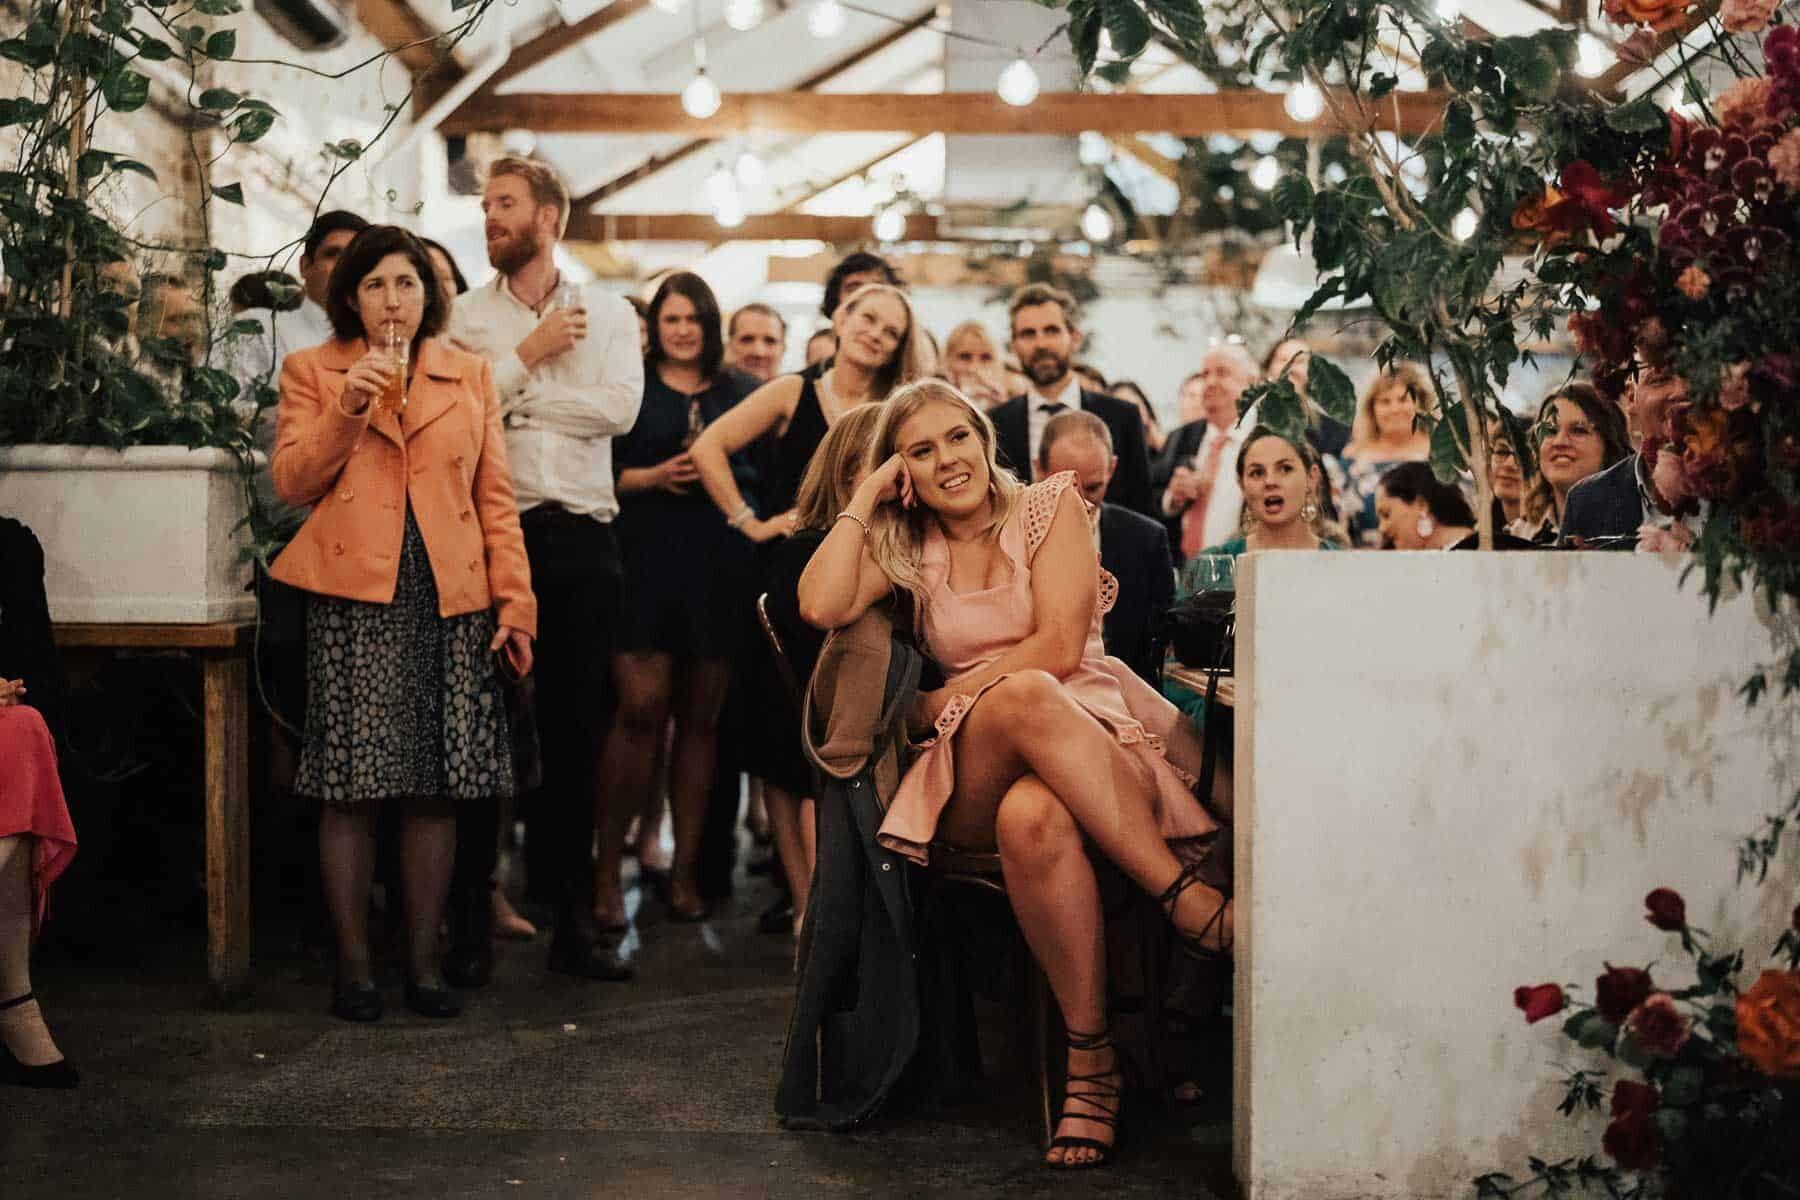 urban wedding at East Elevation in Brunswick, Melbourne